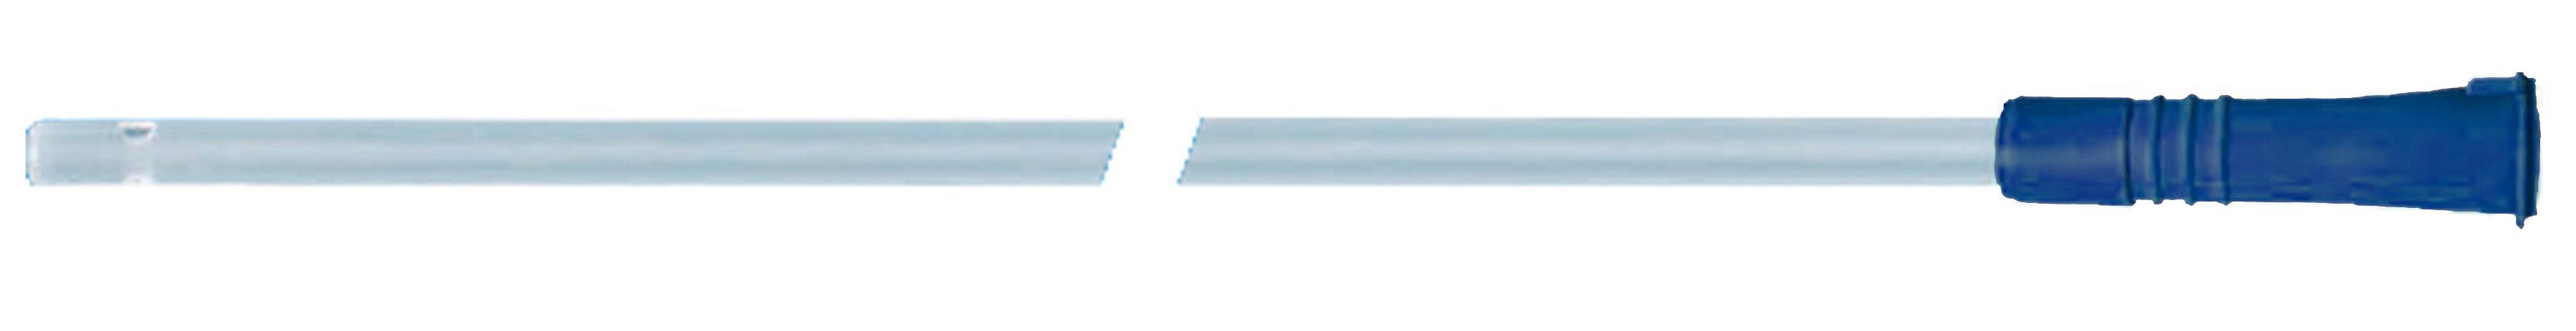 SUGKATETER EXTRUDAN RAK 40CM CH08 STERIL LATEX- OCH FTALATFRI PVC